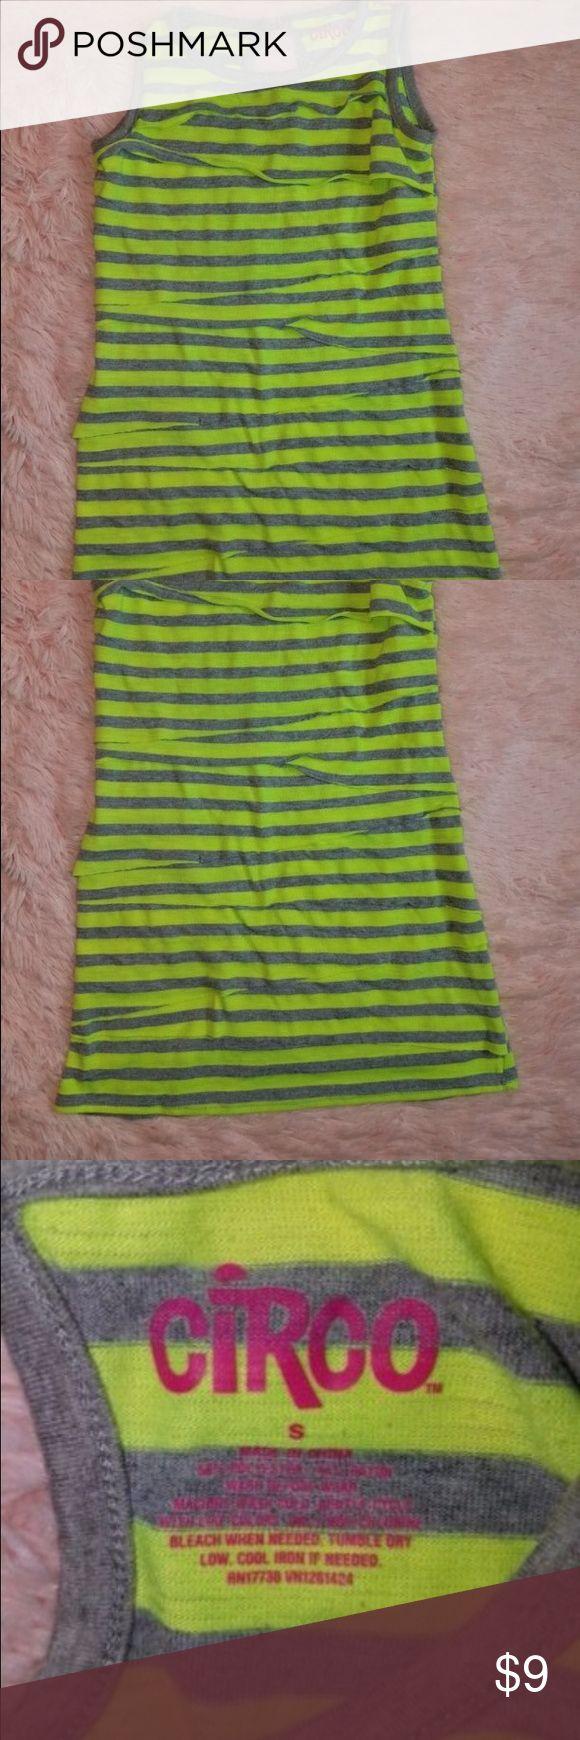 Circo Girls Size Small Lime Green Tank Top Shirt Size Small.  Inv-P Circo Shirts & Tops Tank Tops